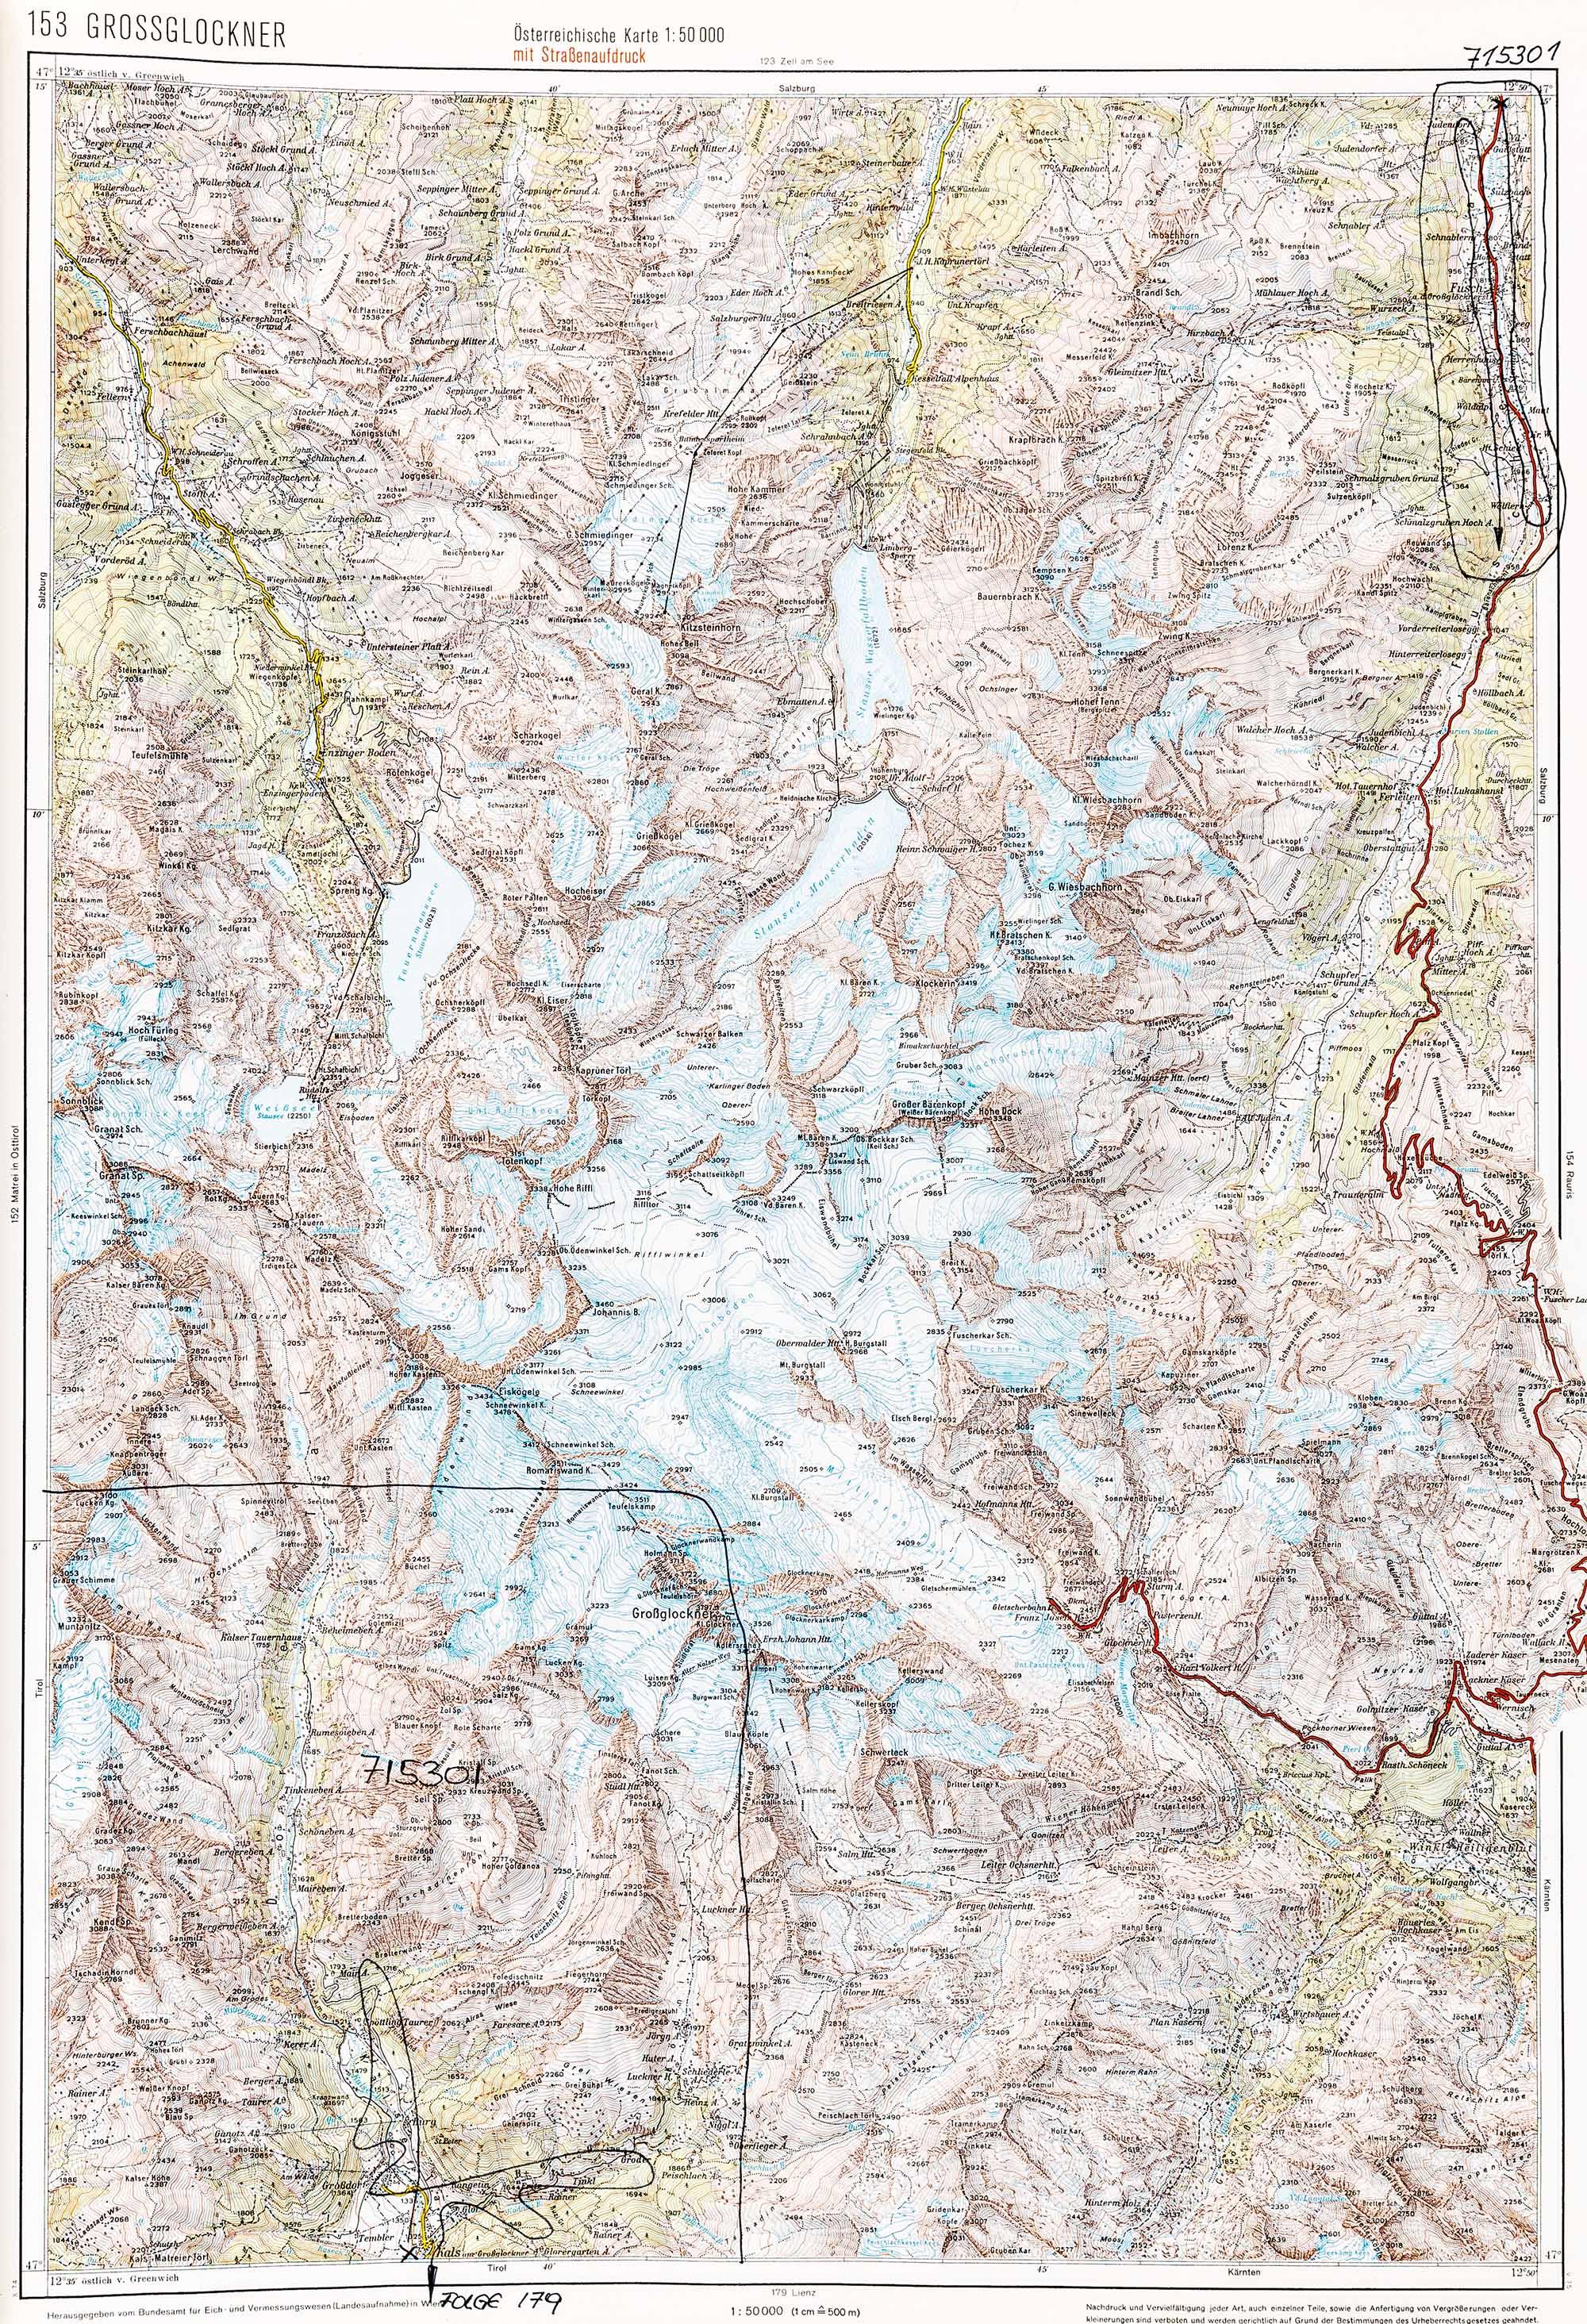 1975-1979 Karte 153